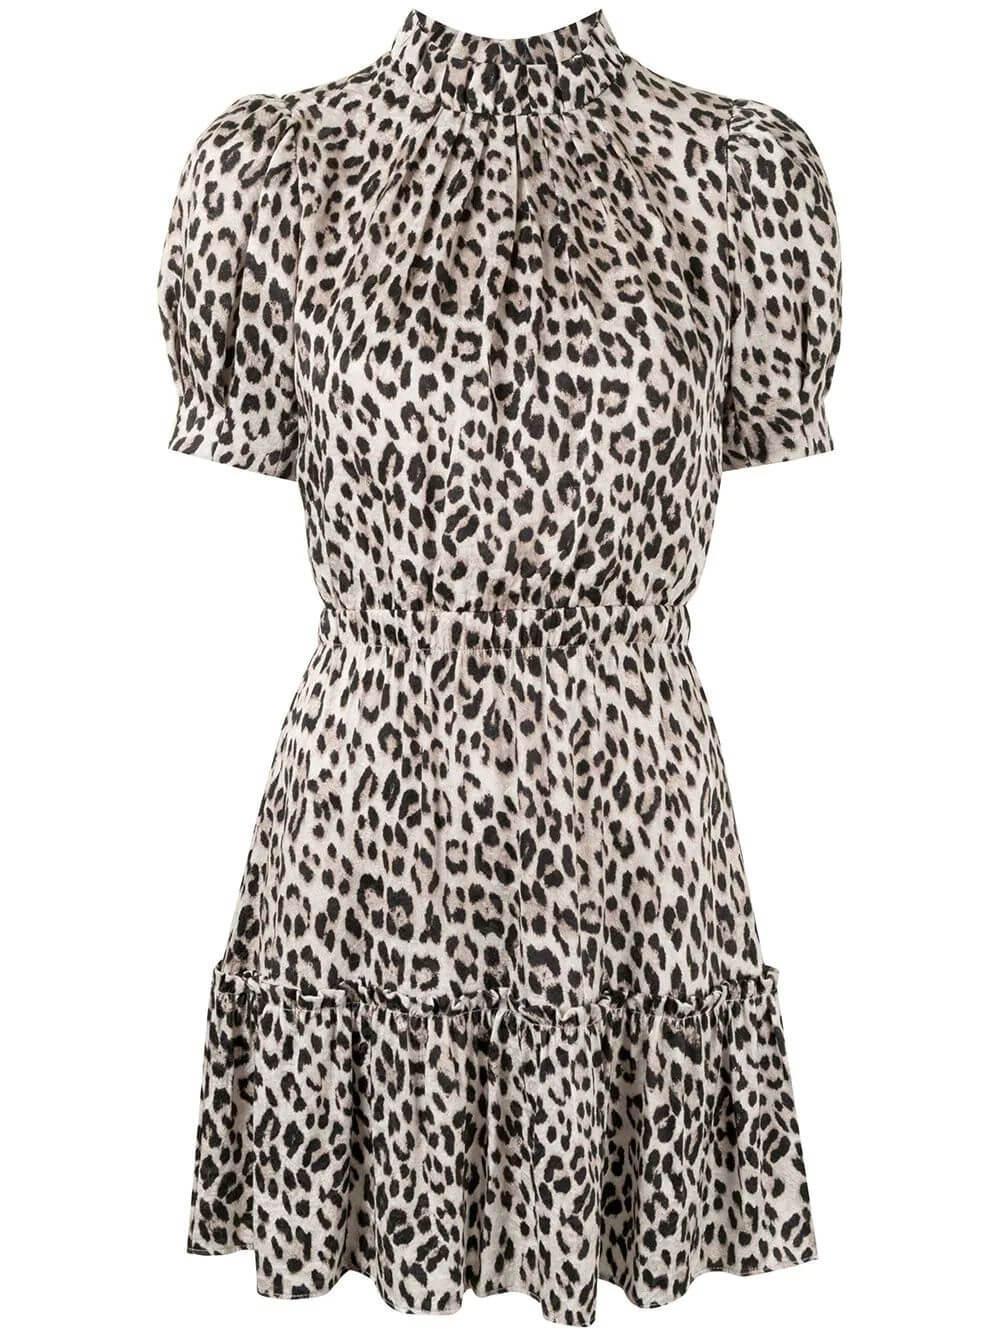 Vida Leopard Print Dress Item # CC010P41511